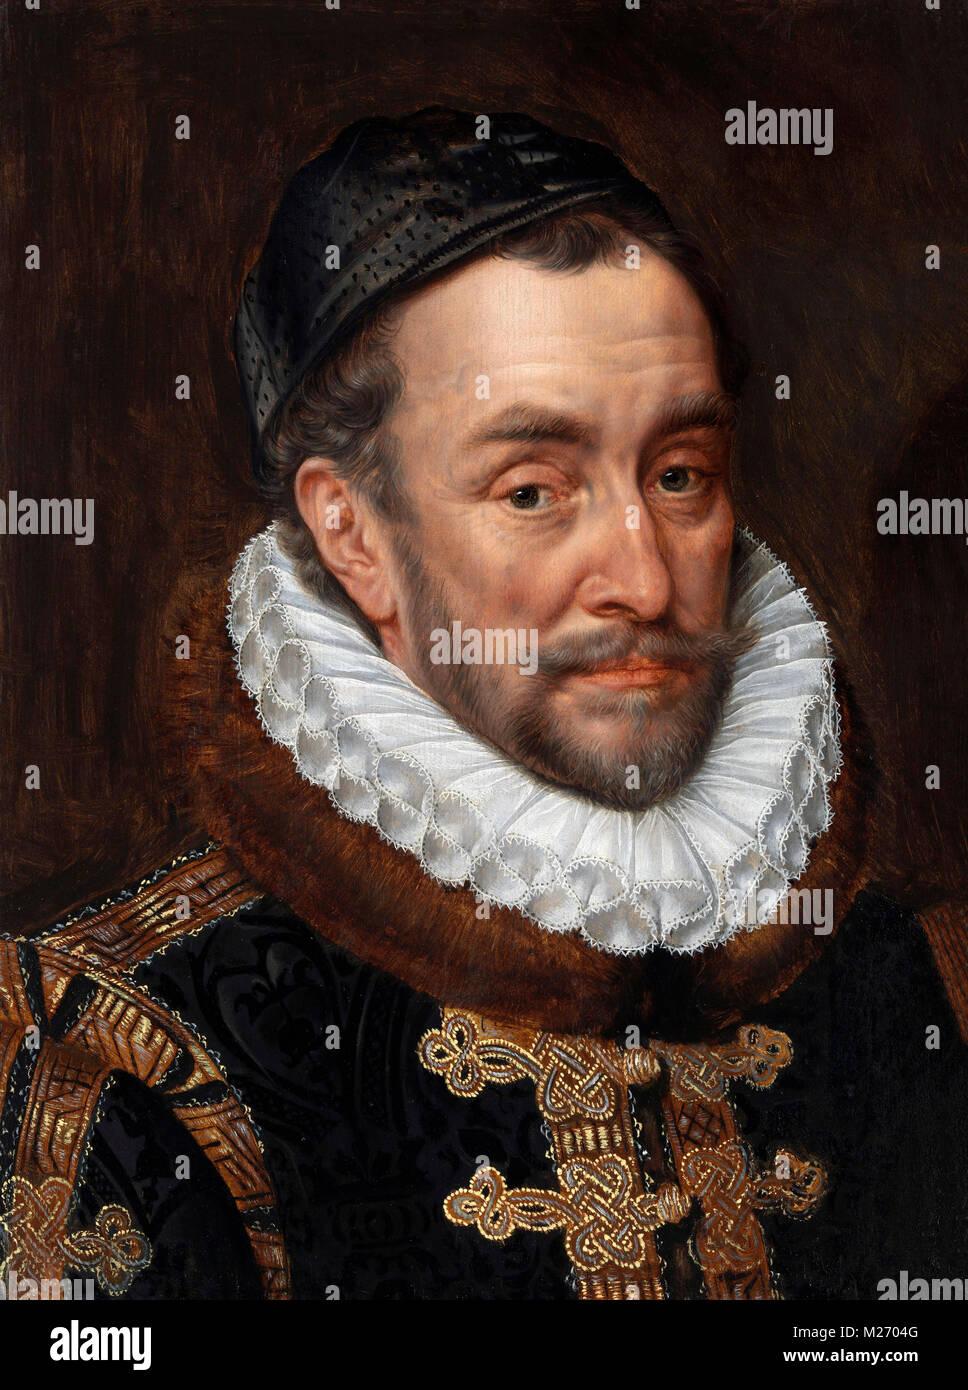 William I, Prince of Orange (1533-1584) by Adriaen Thomasz Kay, oil on panel, c.1579 - Stock Image